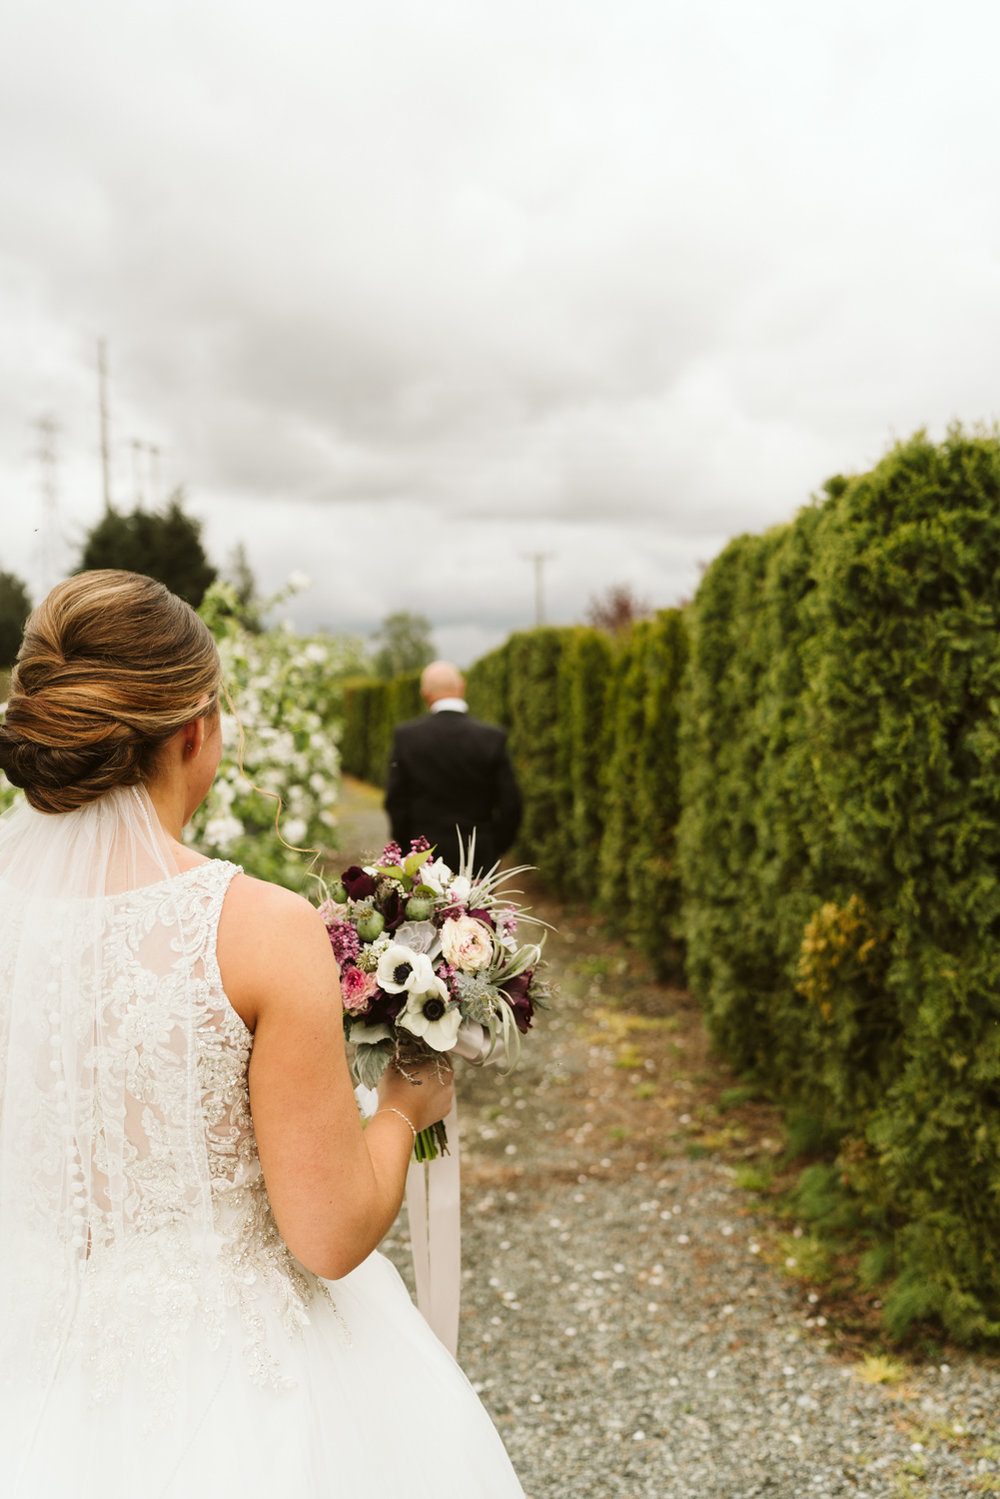 April Yentas Photography - jen and anthony wedding-23.jpg